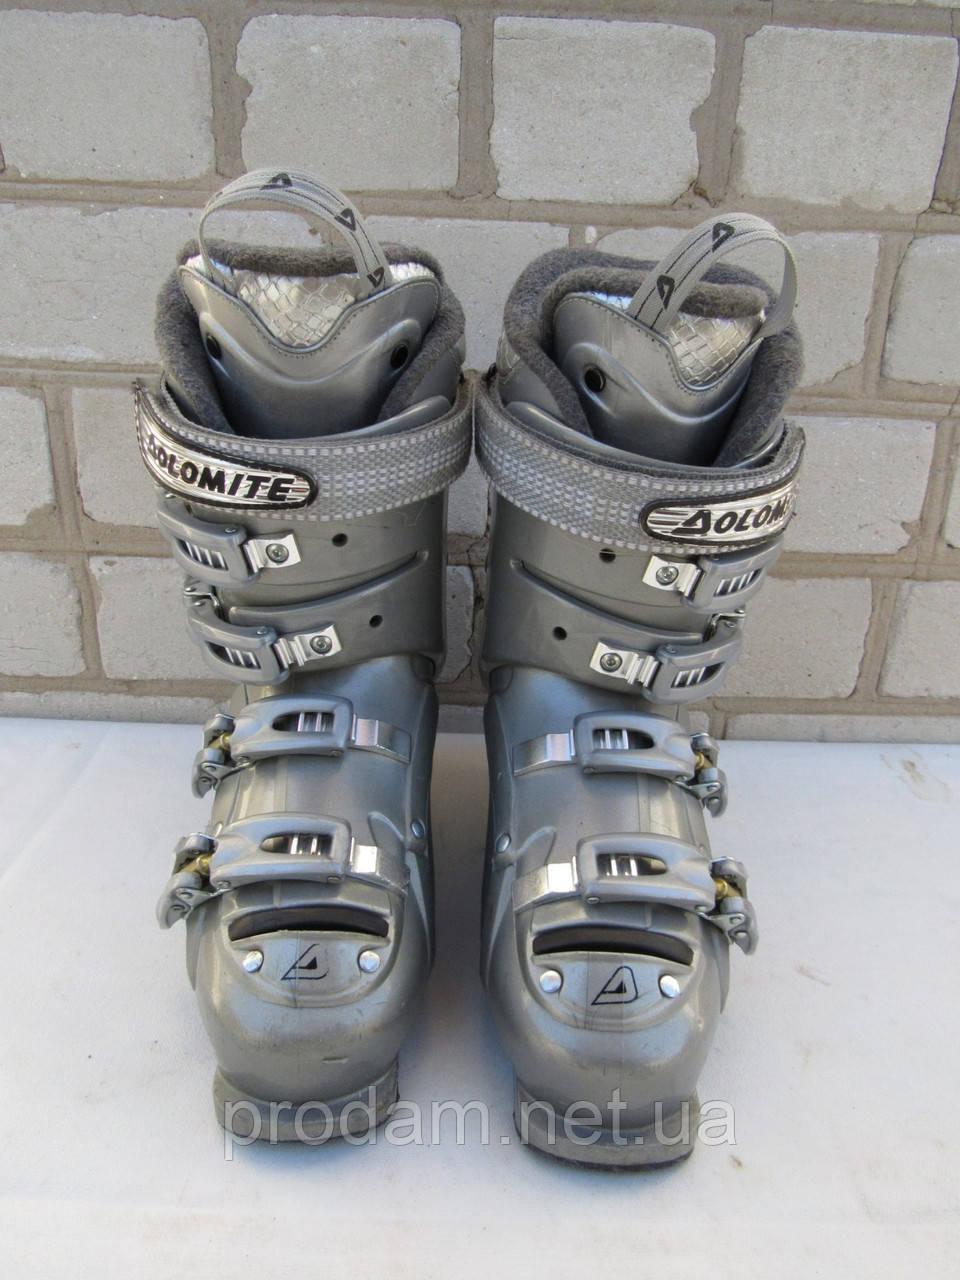 Ботинки лыжные Dolomite Perfecta  розмір 25 см